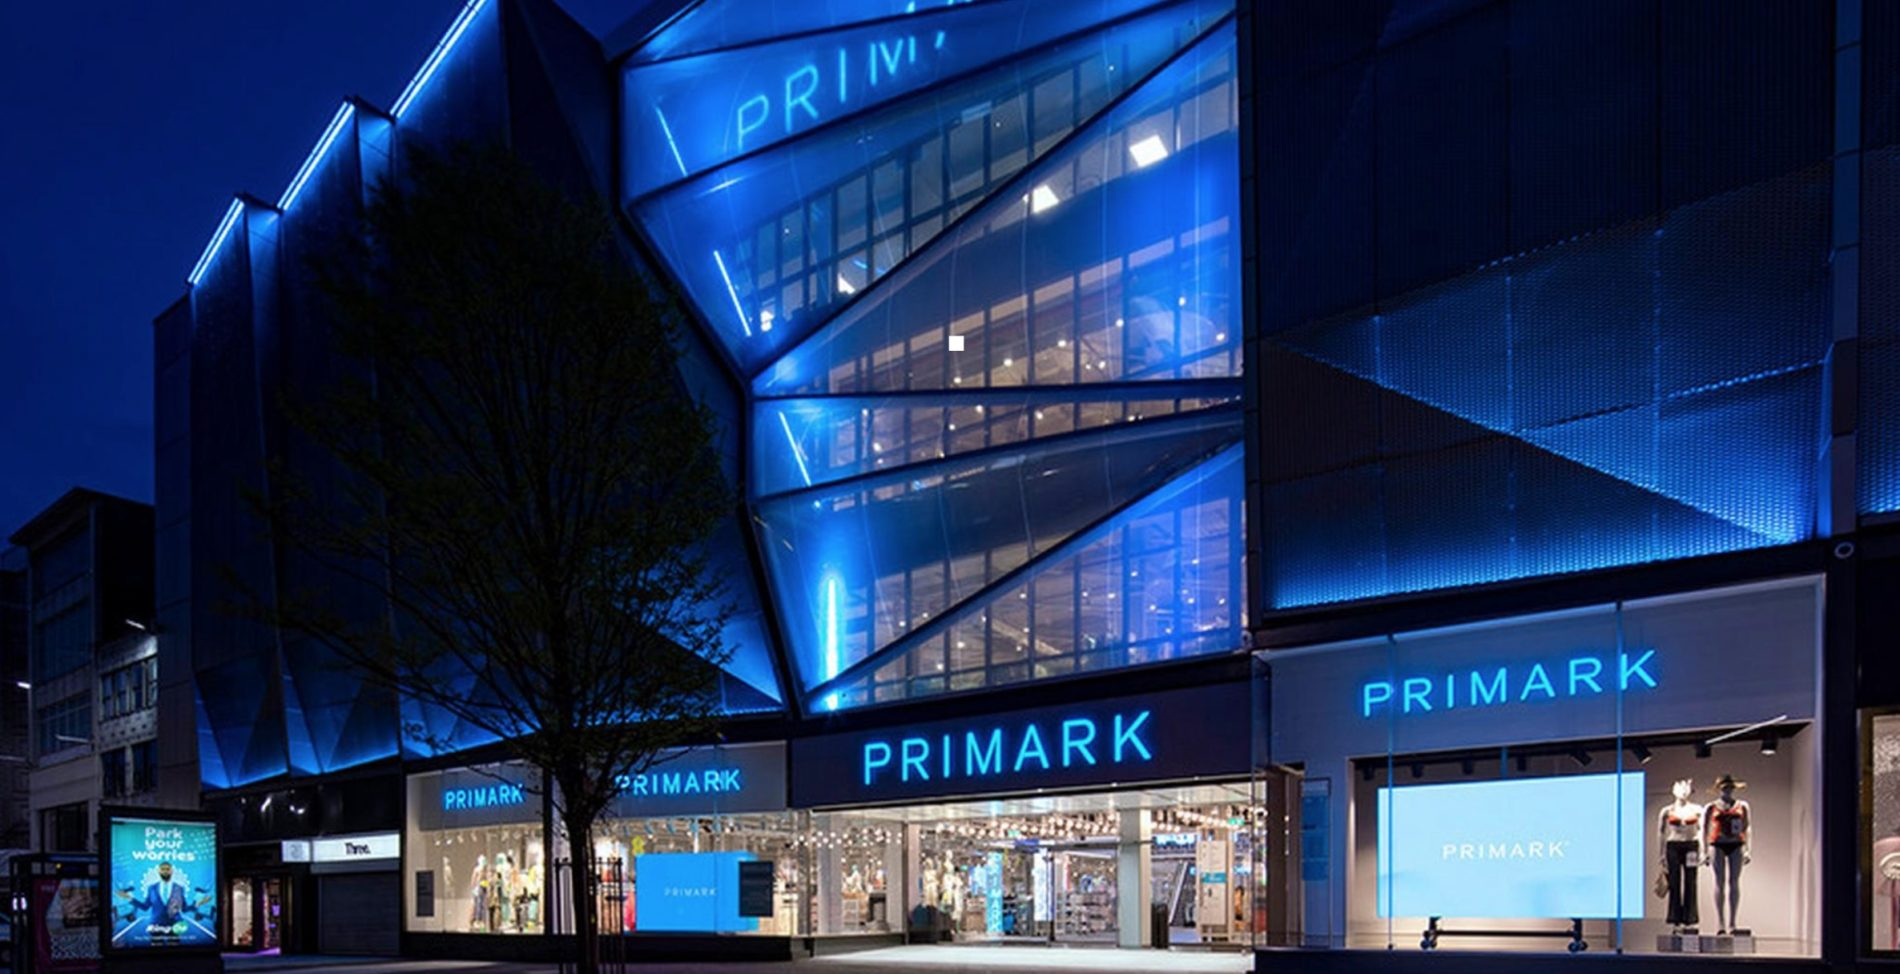 Dove trovare i negozi primark in Italia